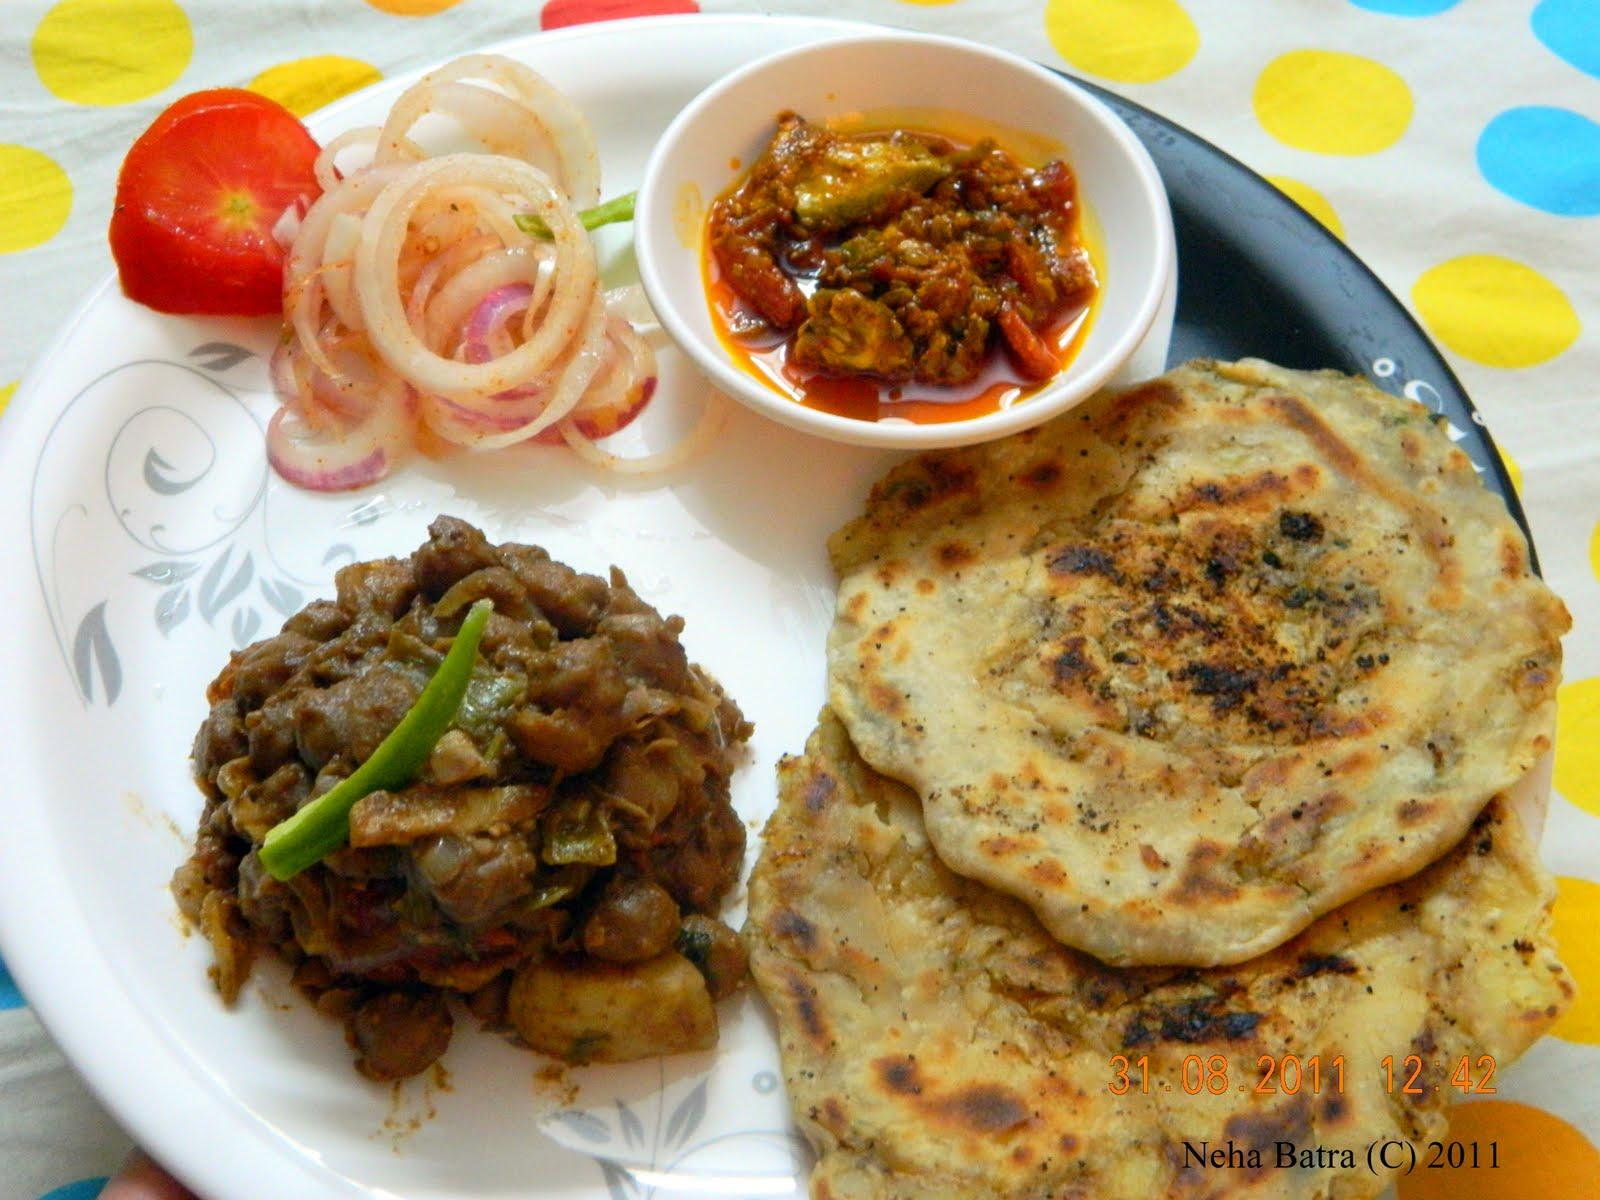 Foodies amritsari kulche stuffed wid aaloo for Amritsari cuisine